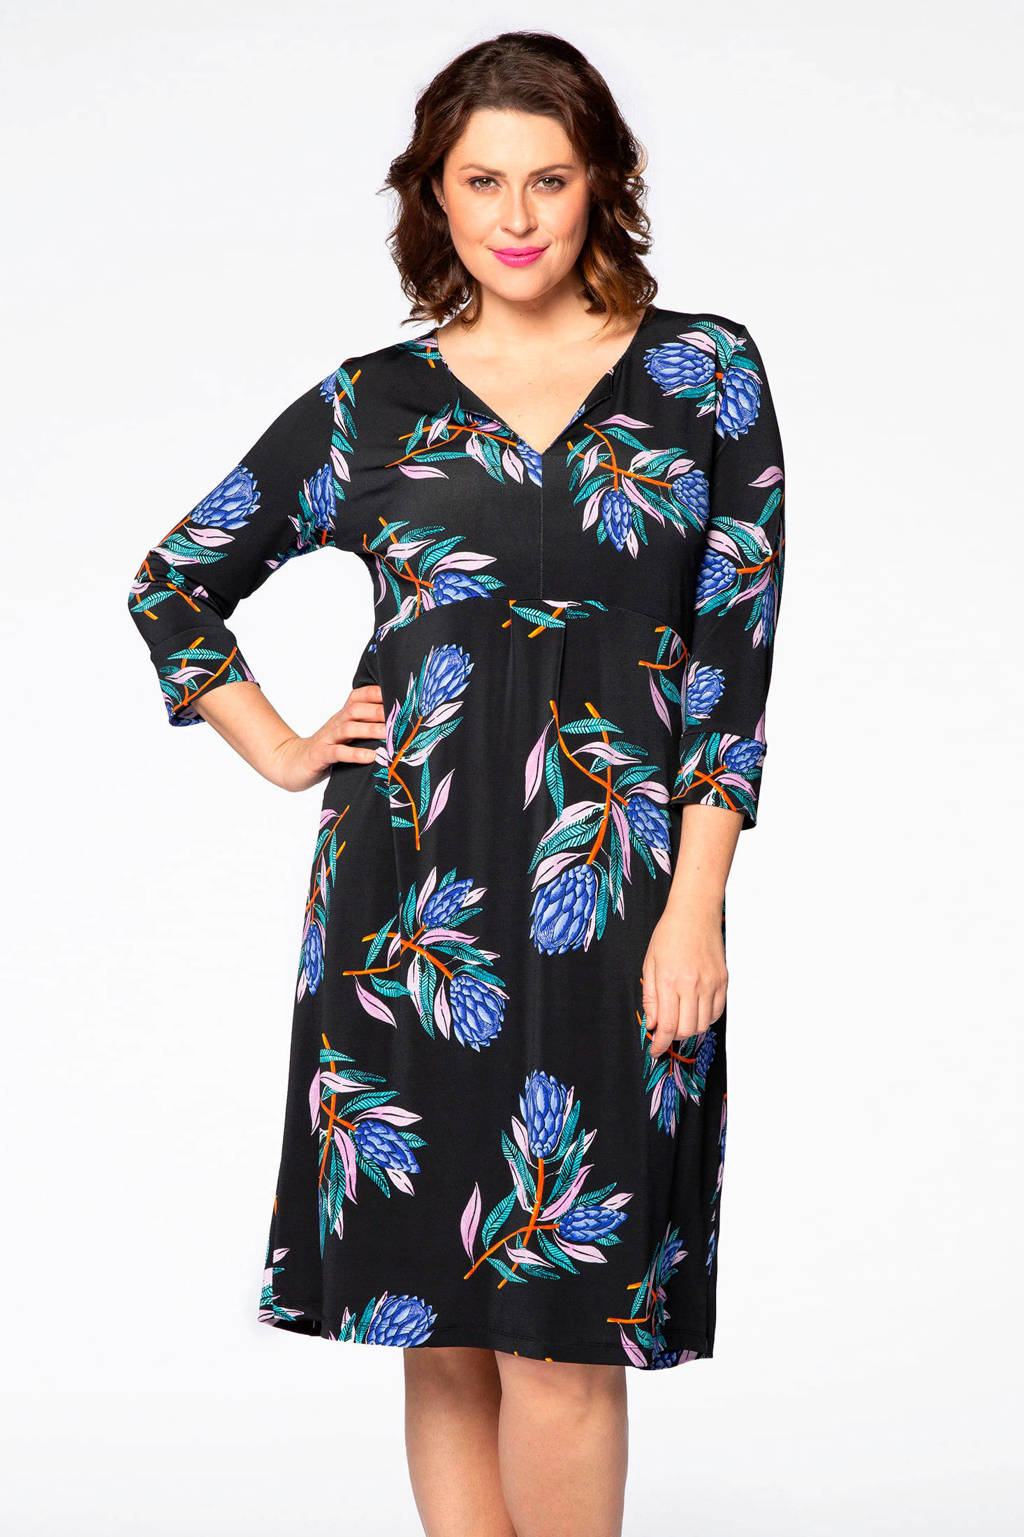 Yoek gebloemde jurk zwart/multi, Zwart/blauw/groen